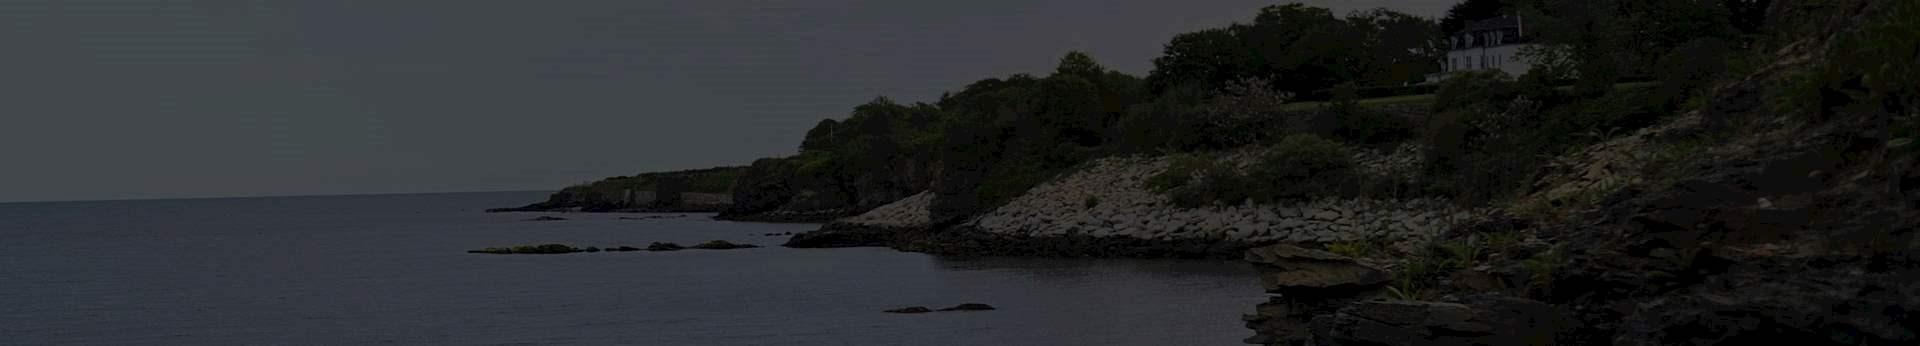 Newport, Rhode Island Cliff Walk